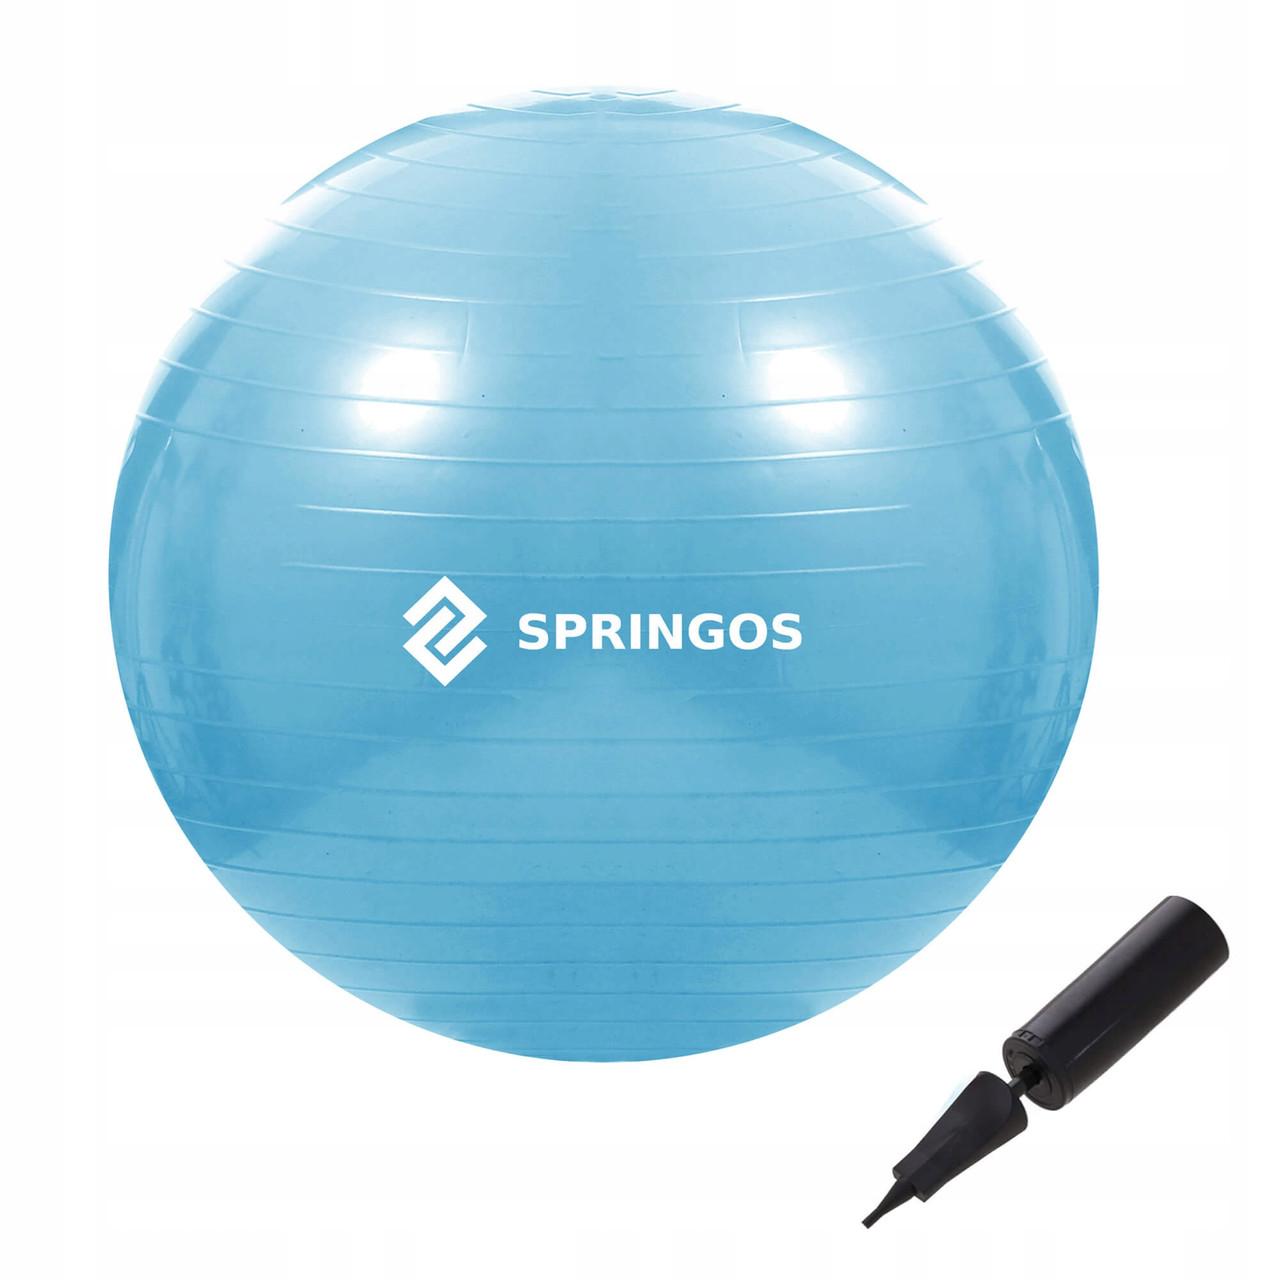 М'яч для фітнесу (фітбол) Springos 55 см Anti-Burst FB0006 Sky Blue